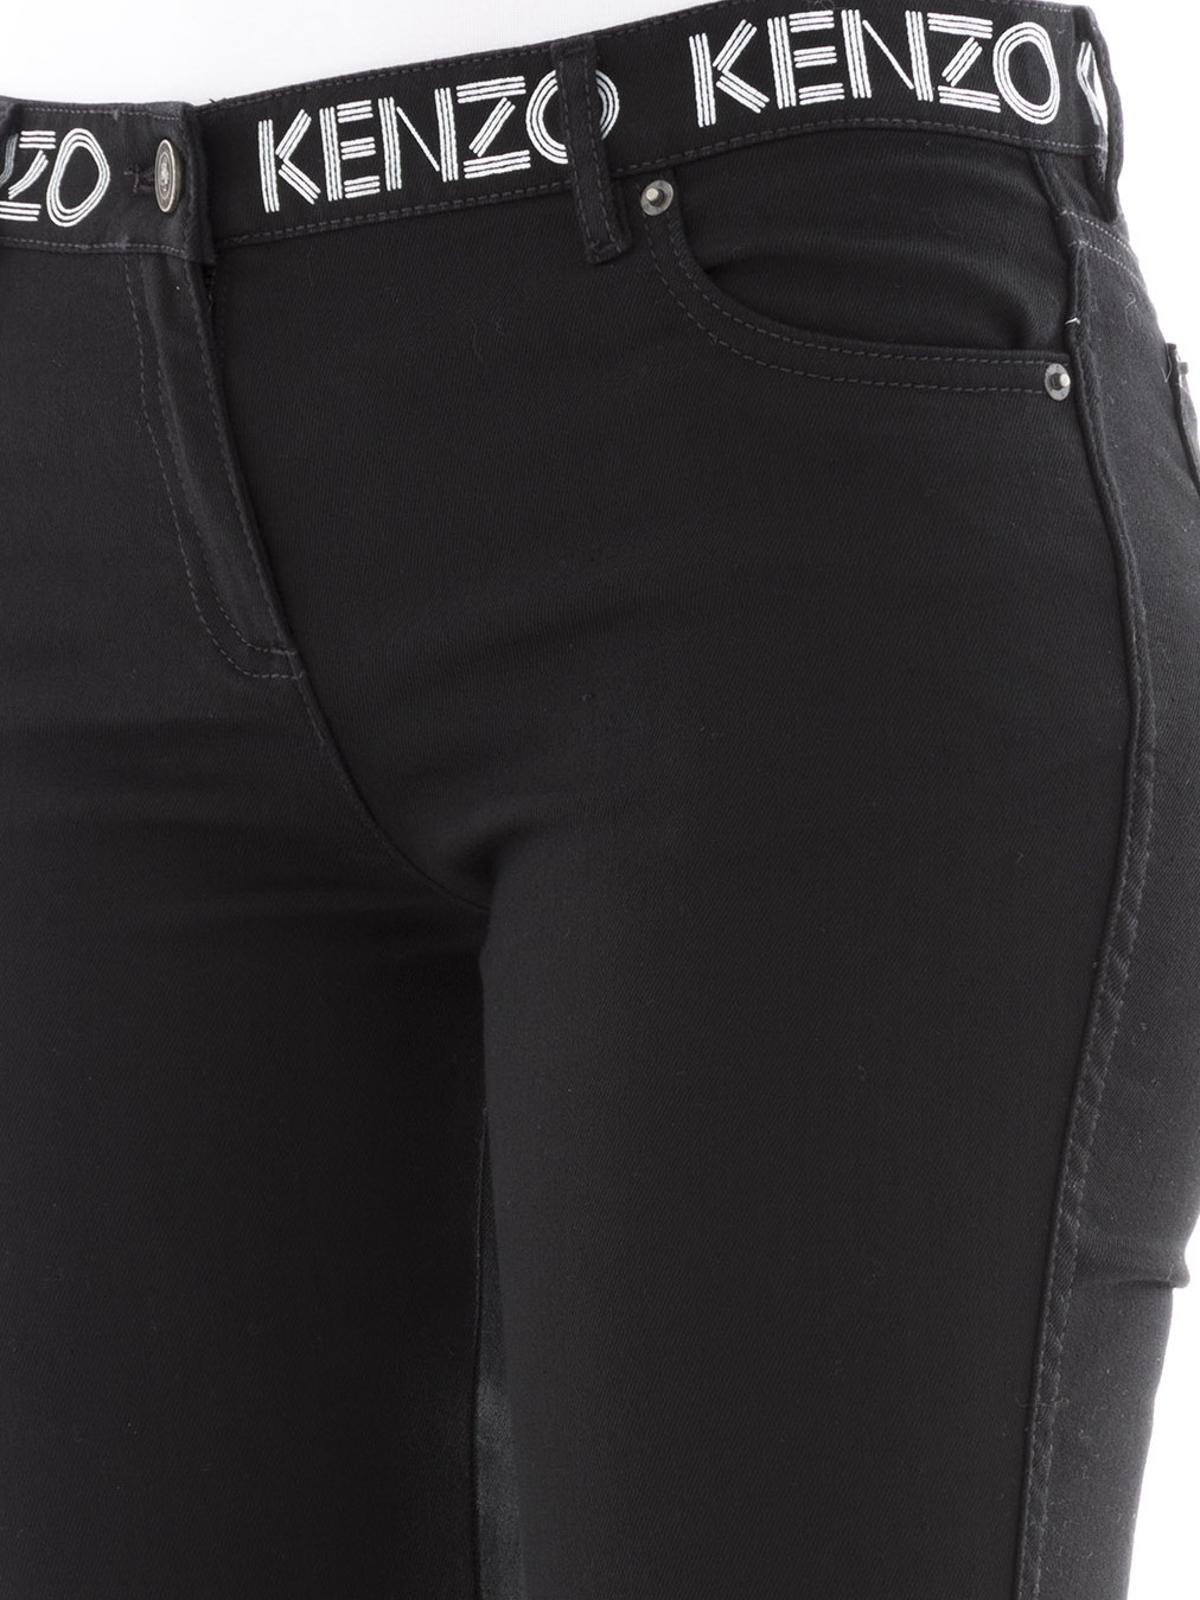 Kenzo - Jean Skinny - Noir - Jeans skinny